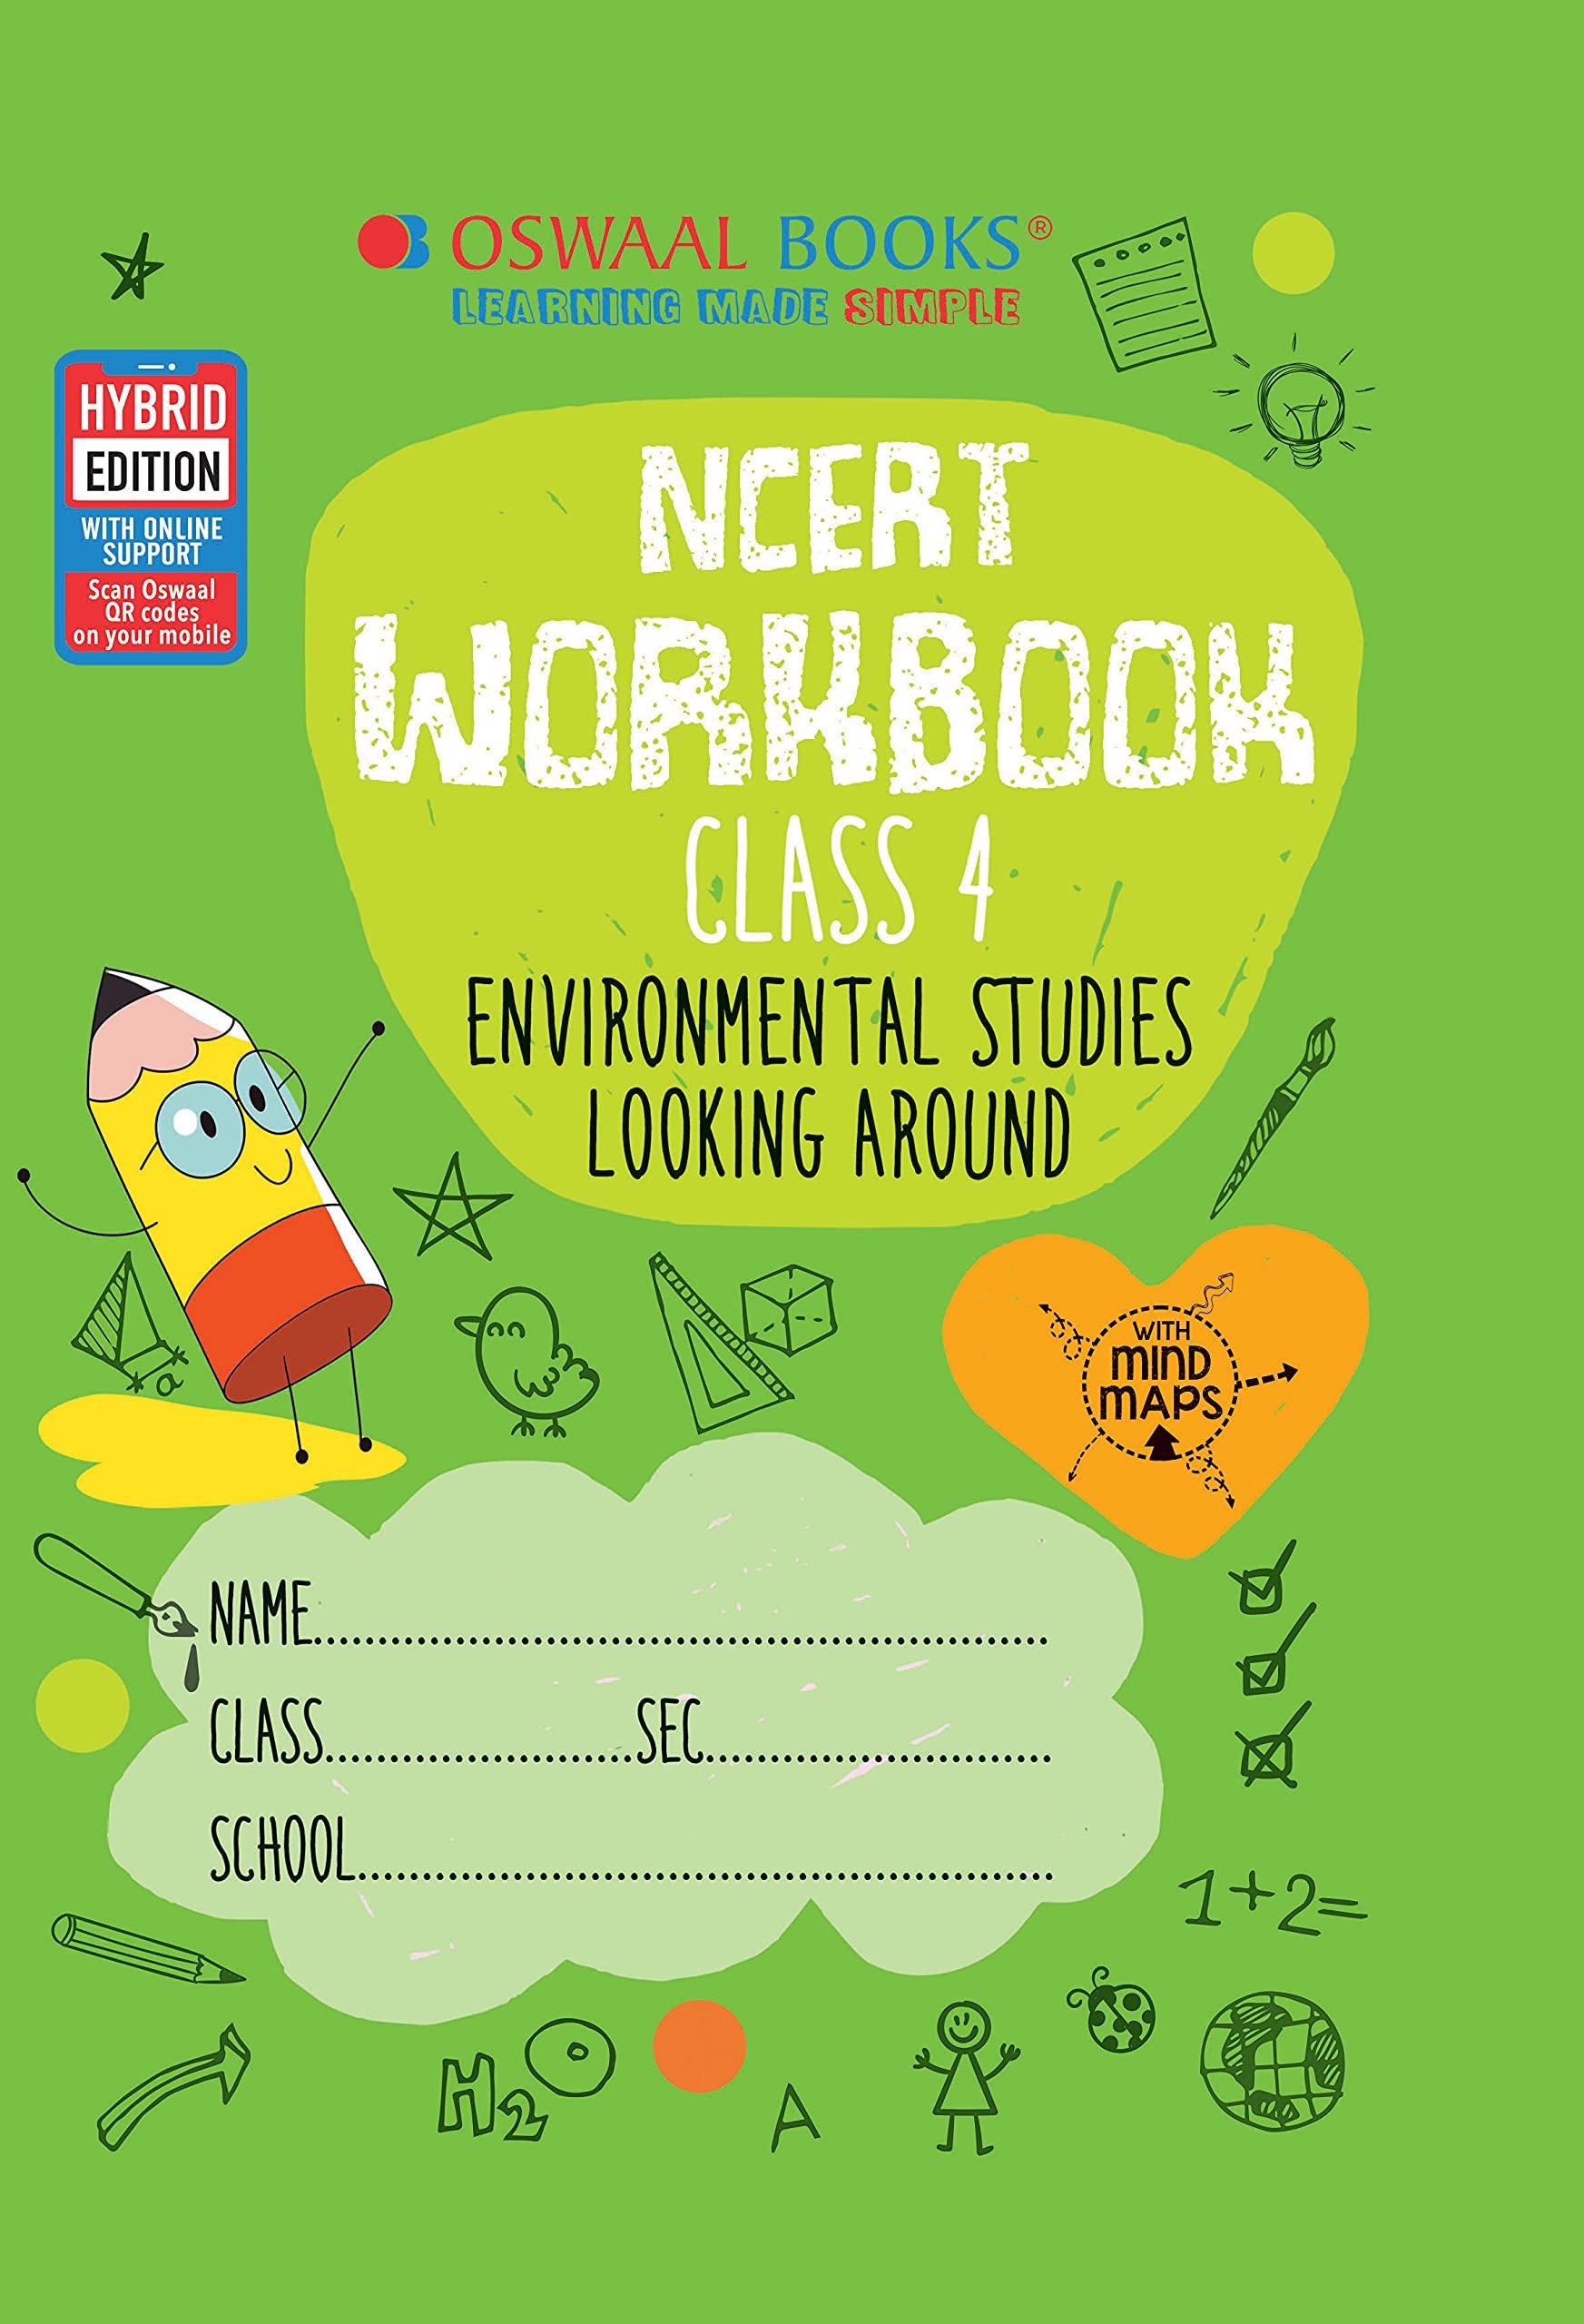 Oswaal NCERT Workbook Class 4, Environmental Studies (For 2022 Exam)